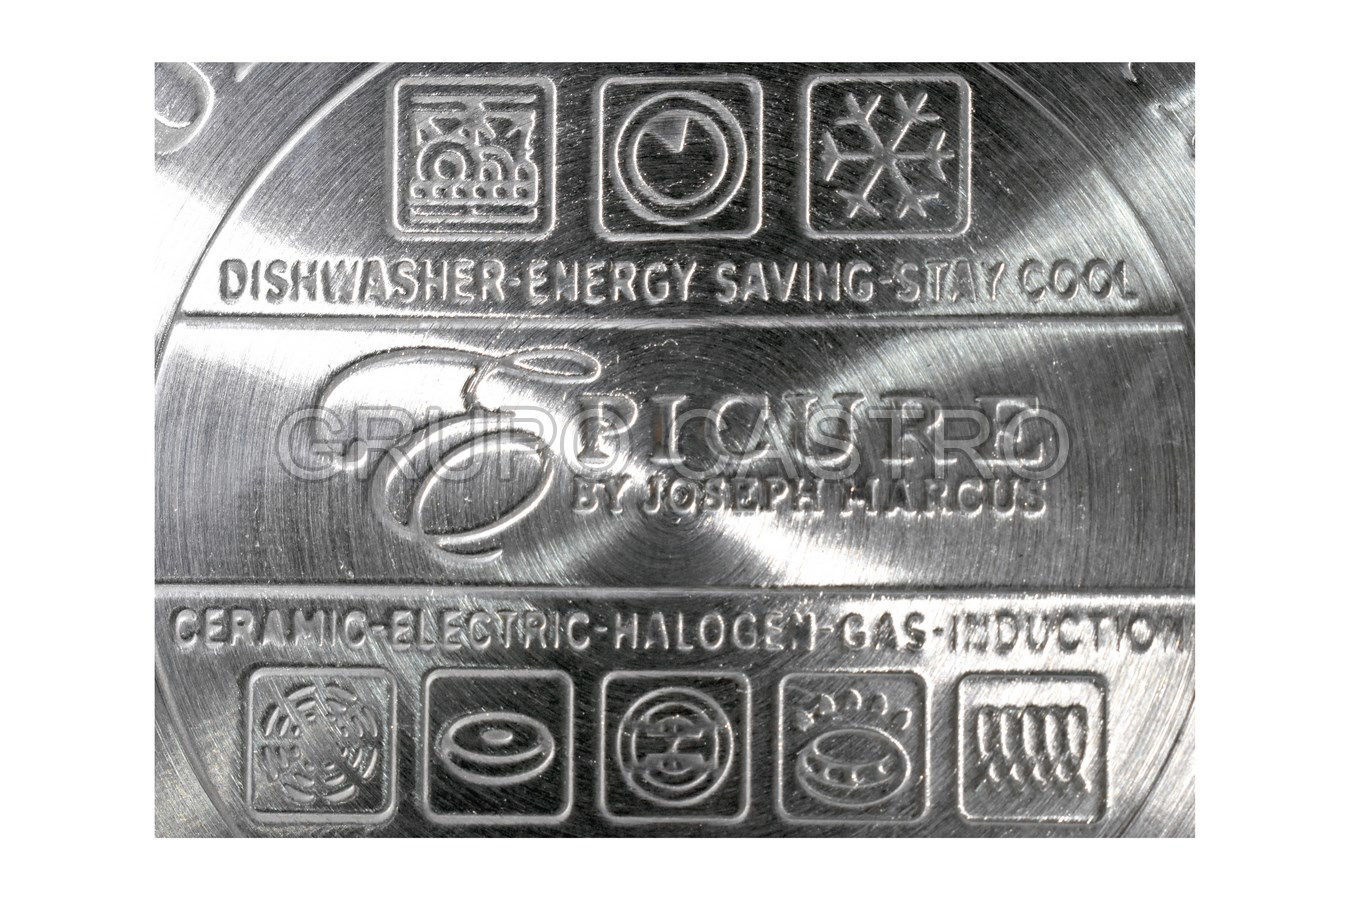 Foto de Jgo ollas acero inox t/vidrio picure disco difusor 12 pcs 8.6kgs  2x16/1X18/1x20/2x24cms EP-12TFGL